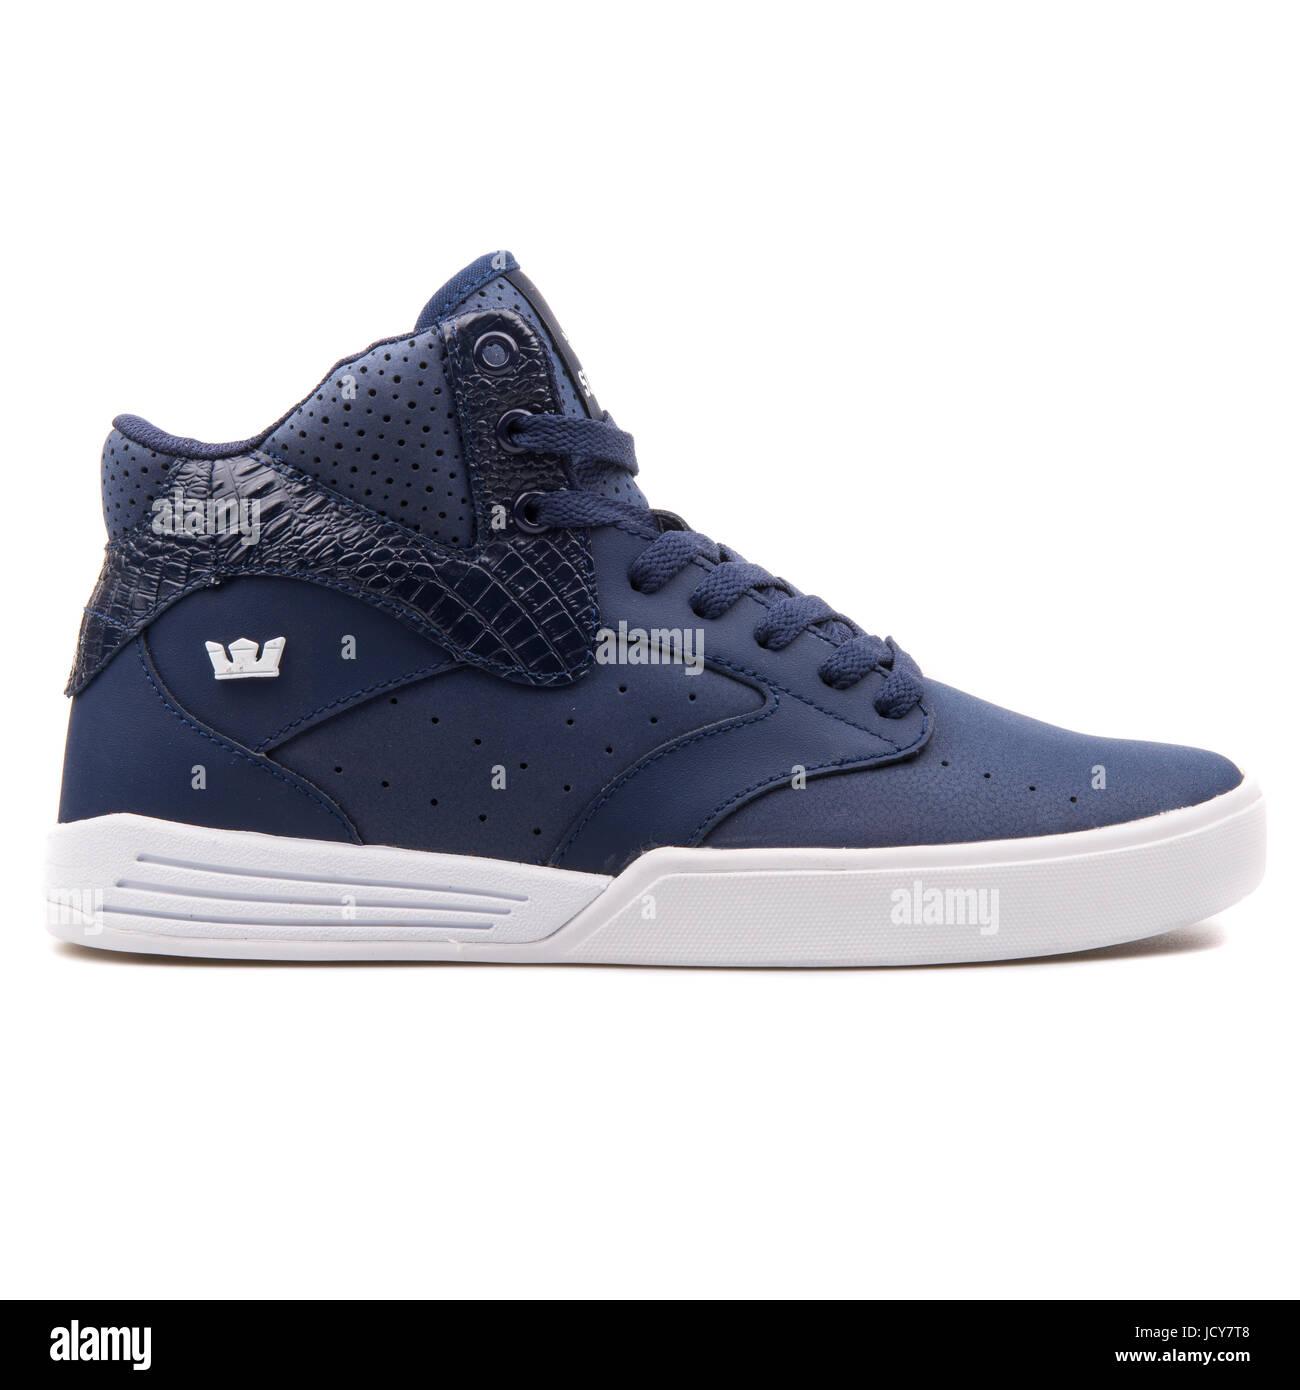 3503ca8d8ba Supra Khan Navy Blue and White Men's hi Shoes - S16022 Stock Photo ...